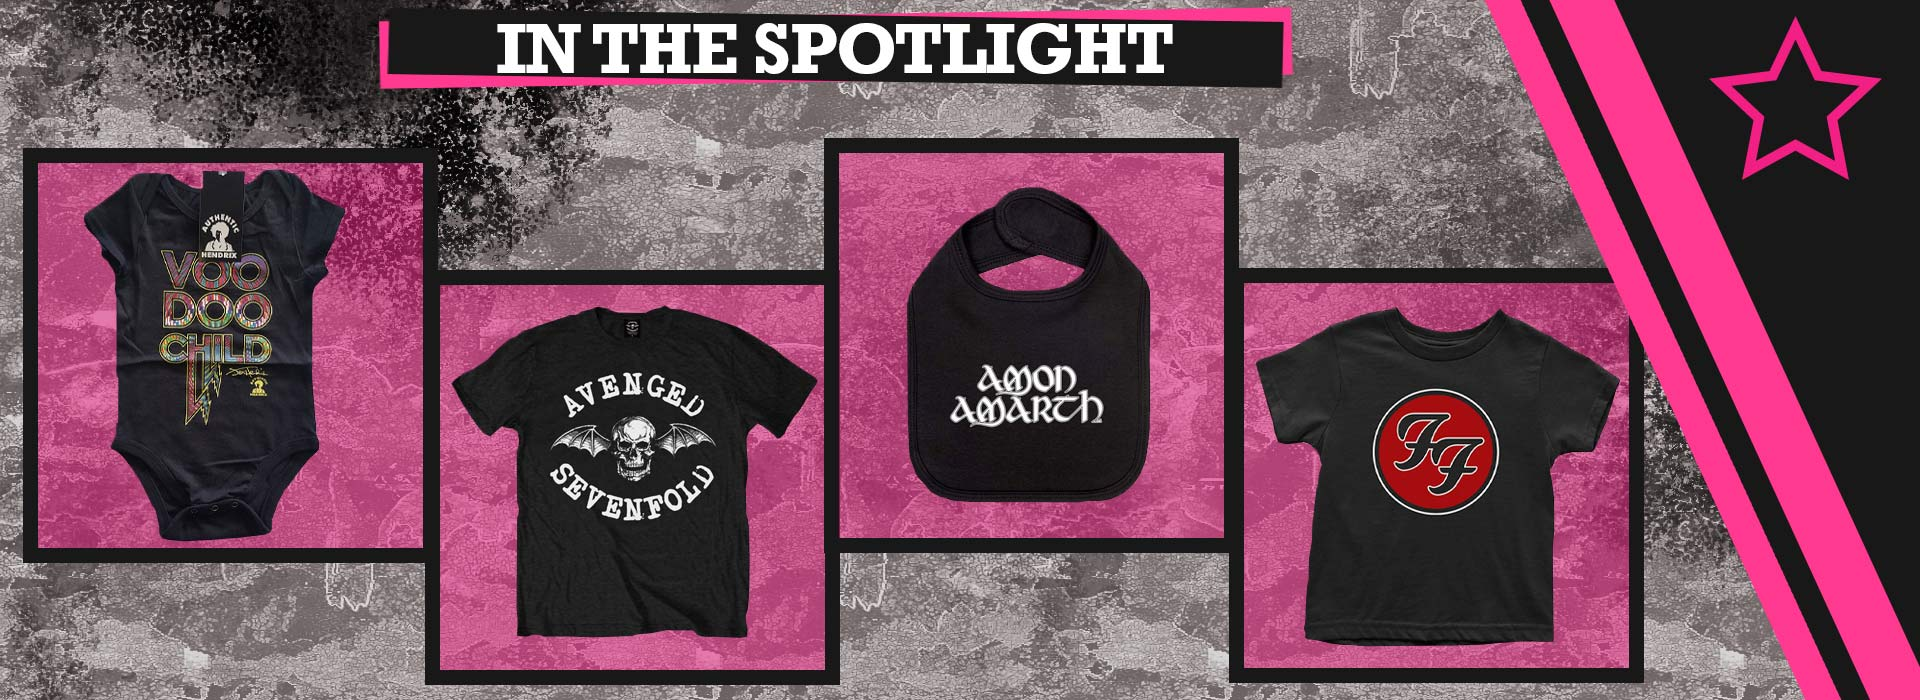 In the spotlight! Jimi Hendrix Avenged Sevenfold Amon Amarth Foo Fighters